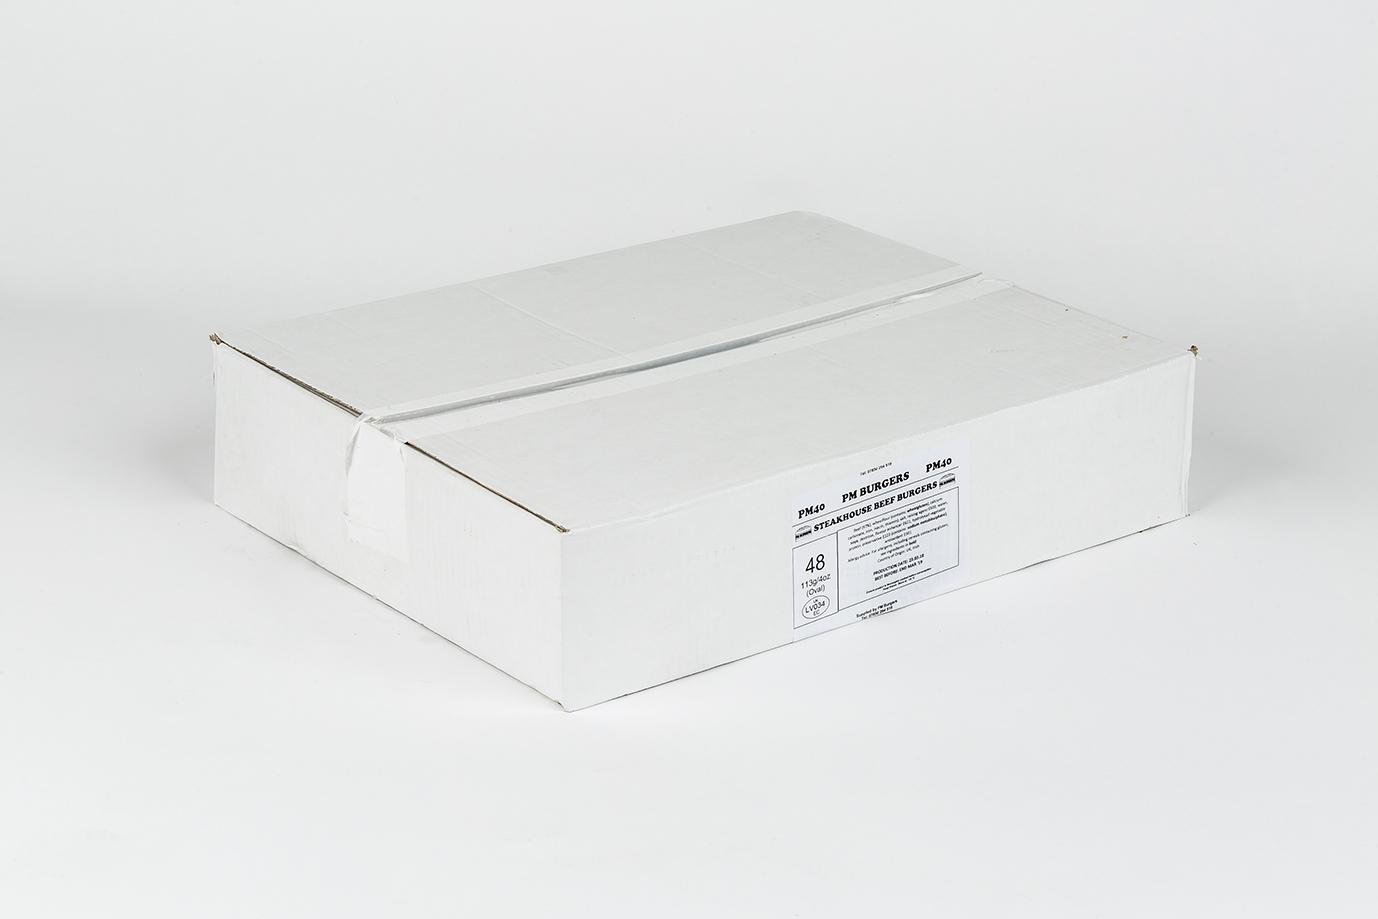 Image of Steakhouse 4oz Burger x 48 per box